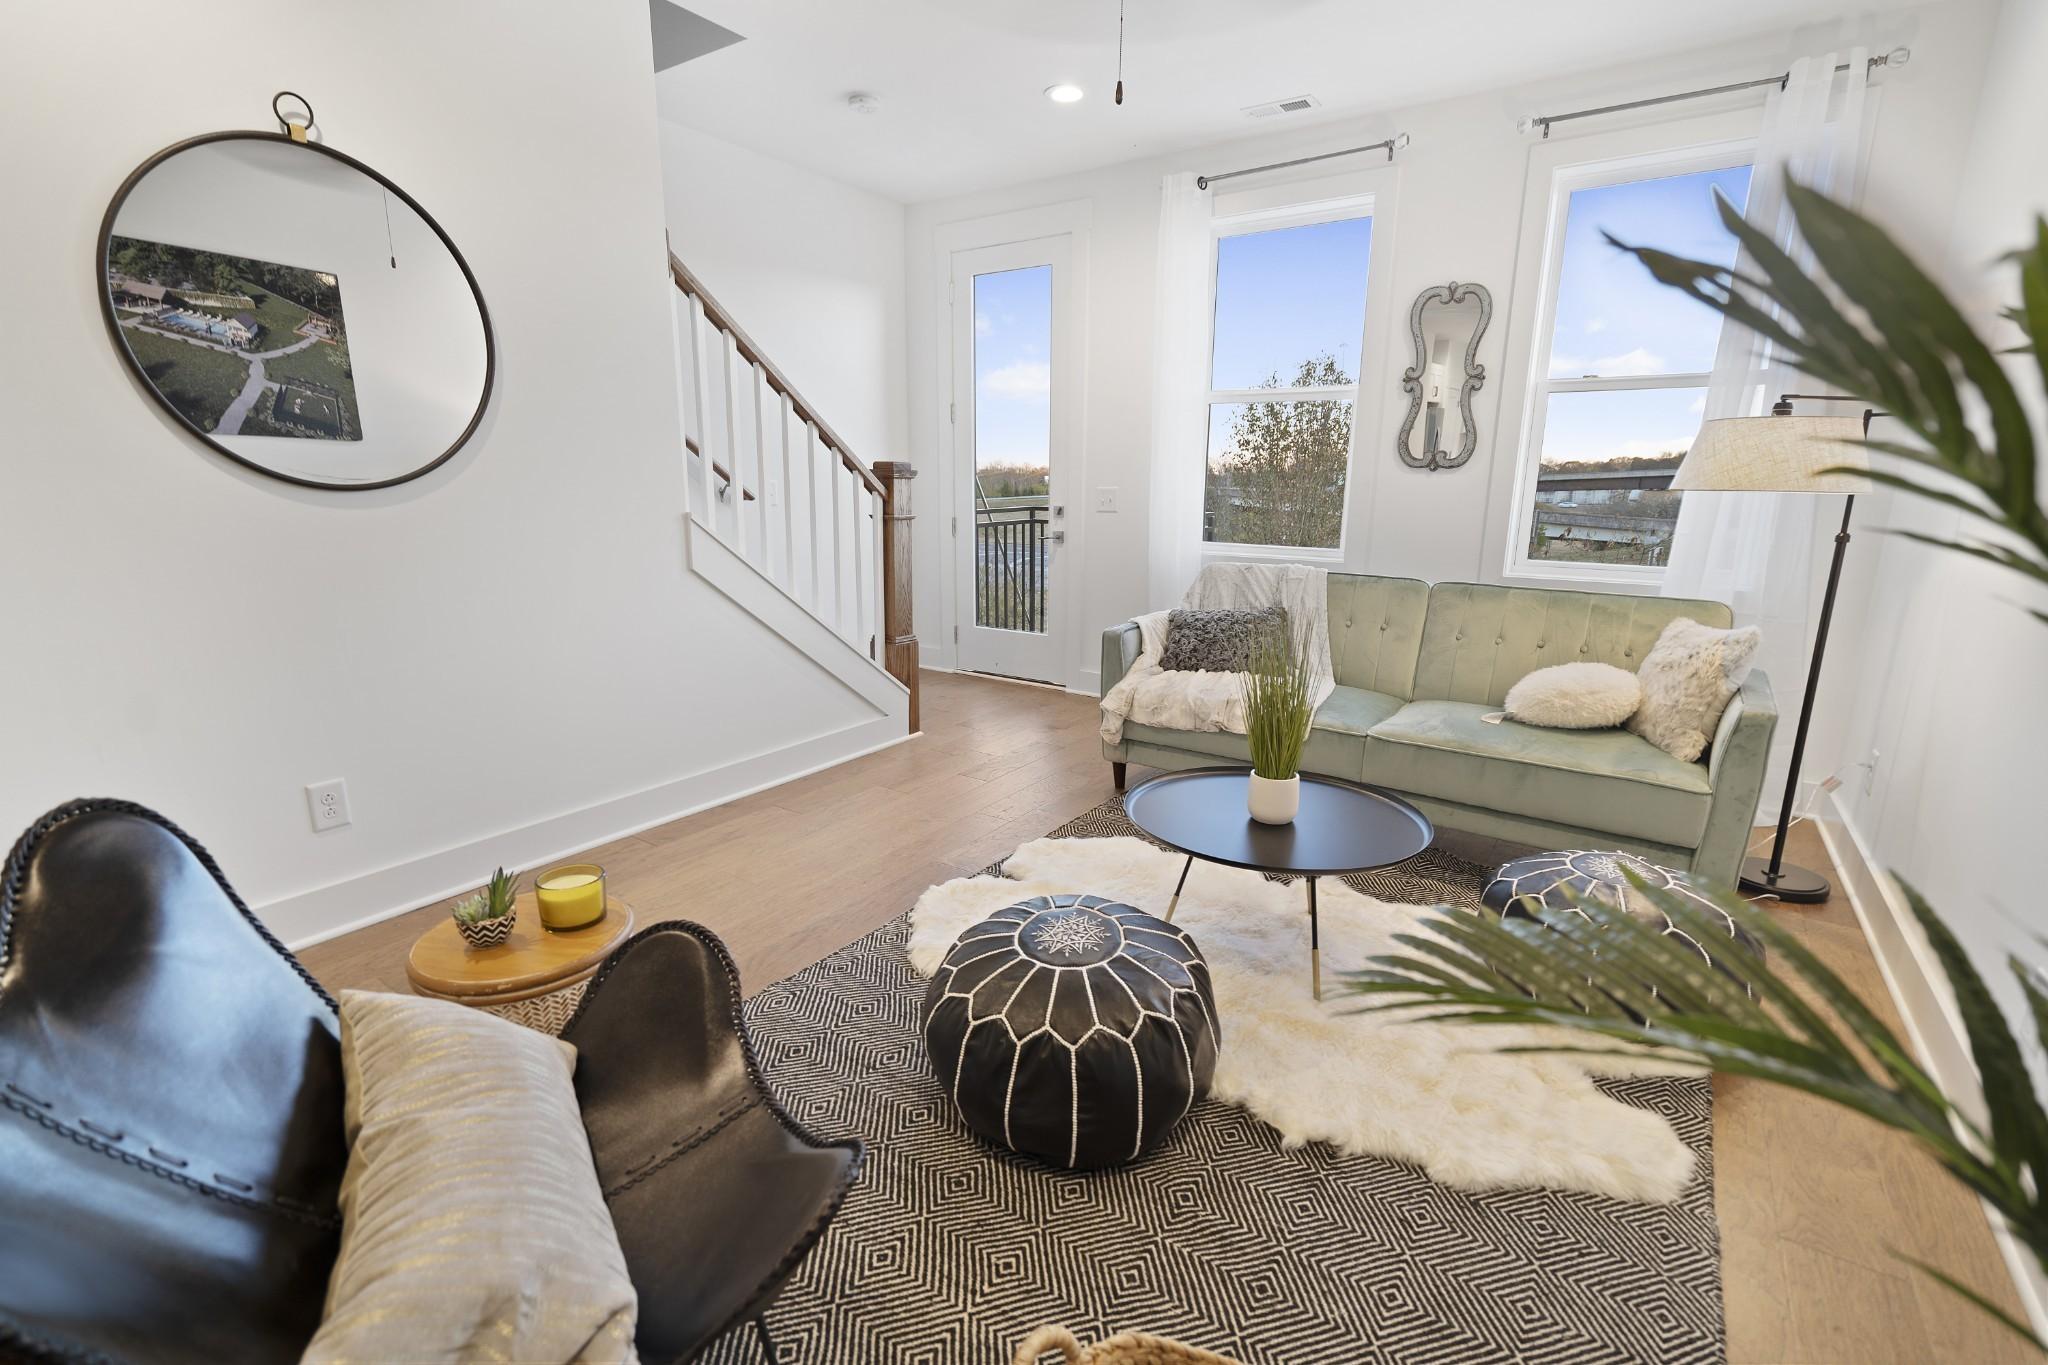 732 Inspiration Blvd #2 Property Photo - Madison, TN real estate listing